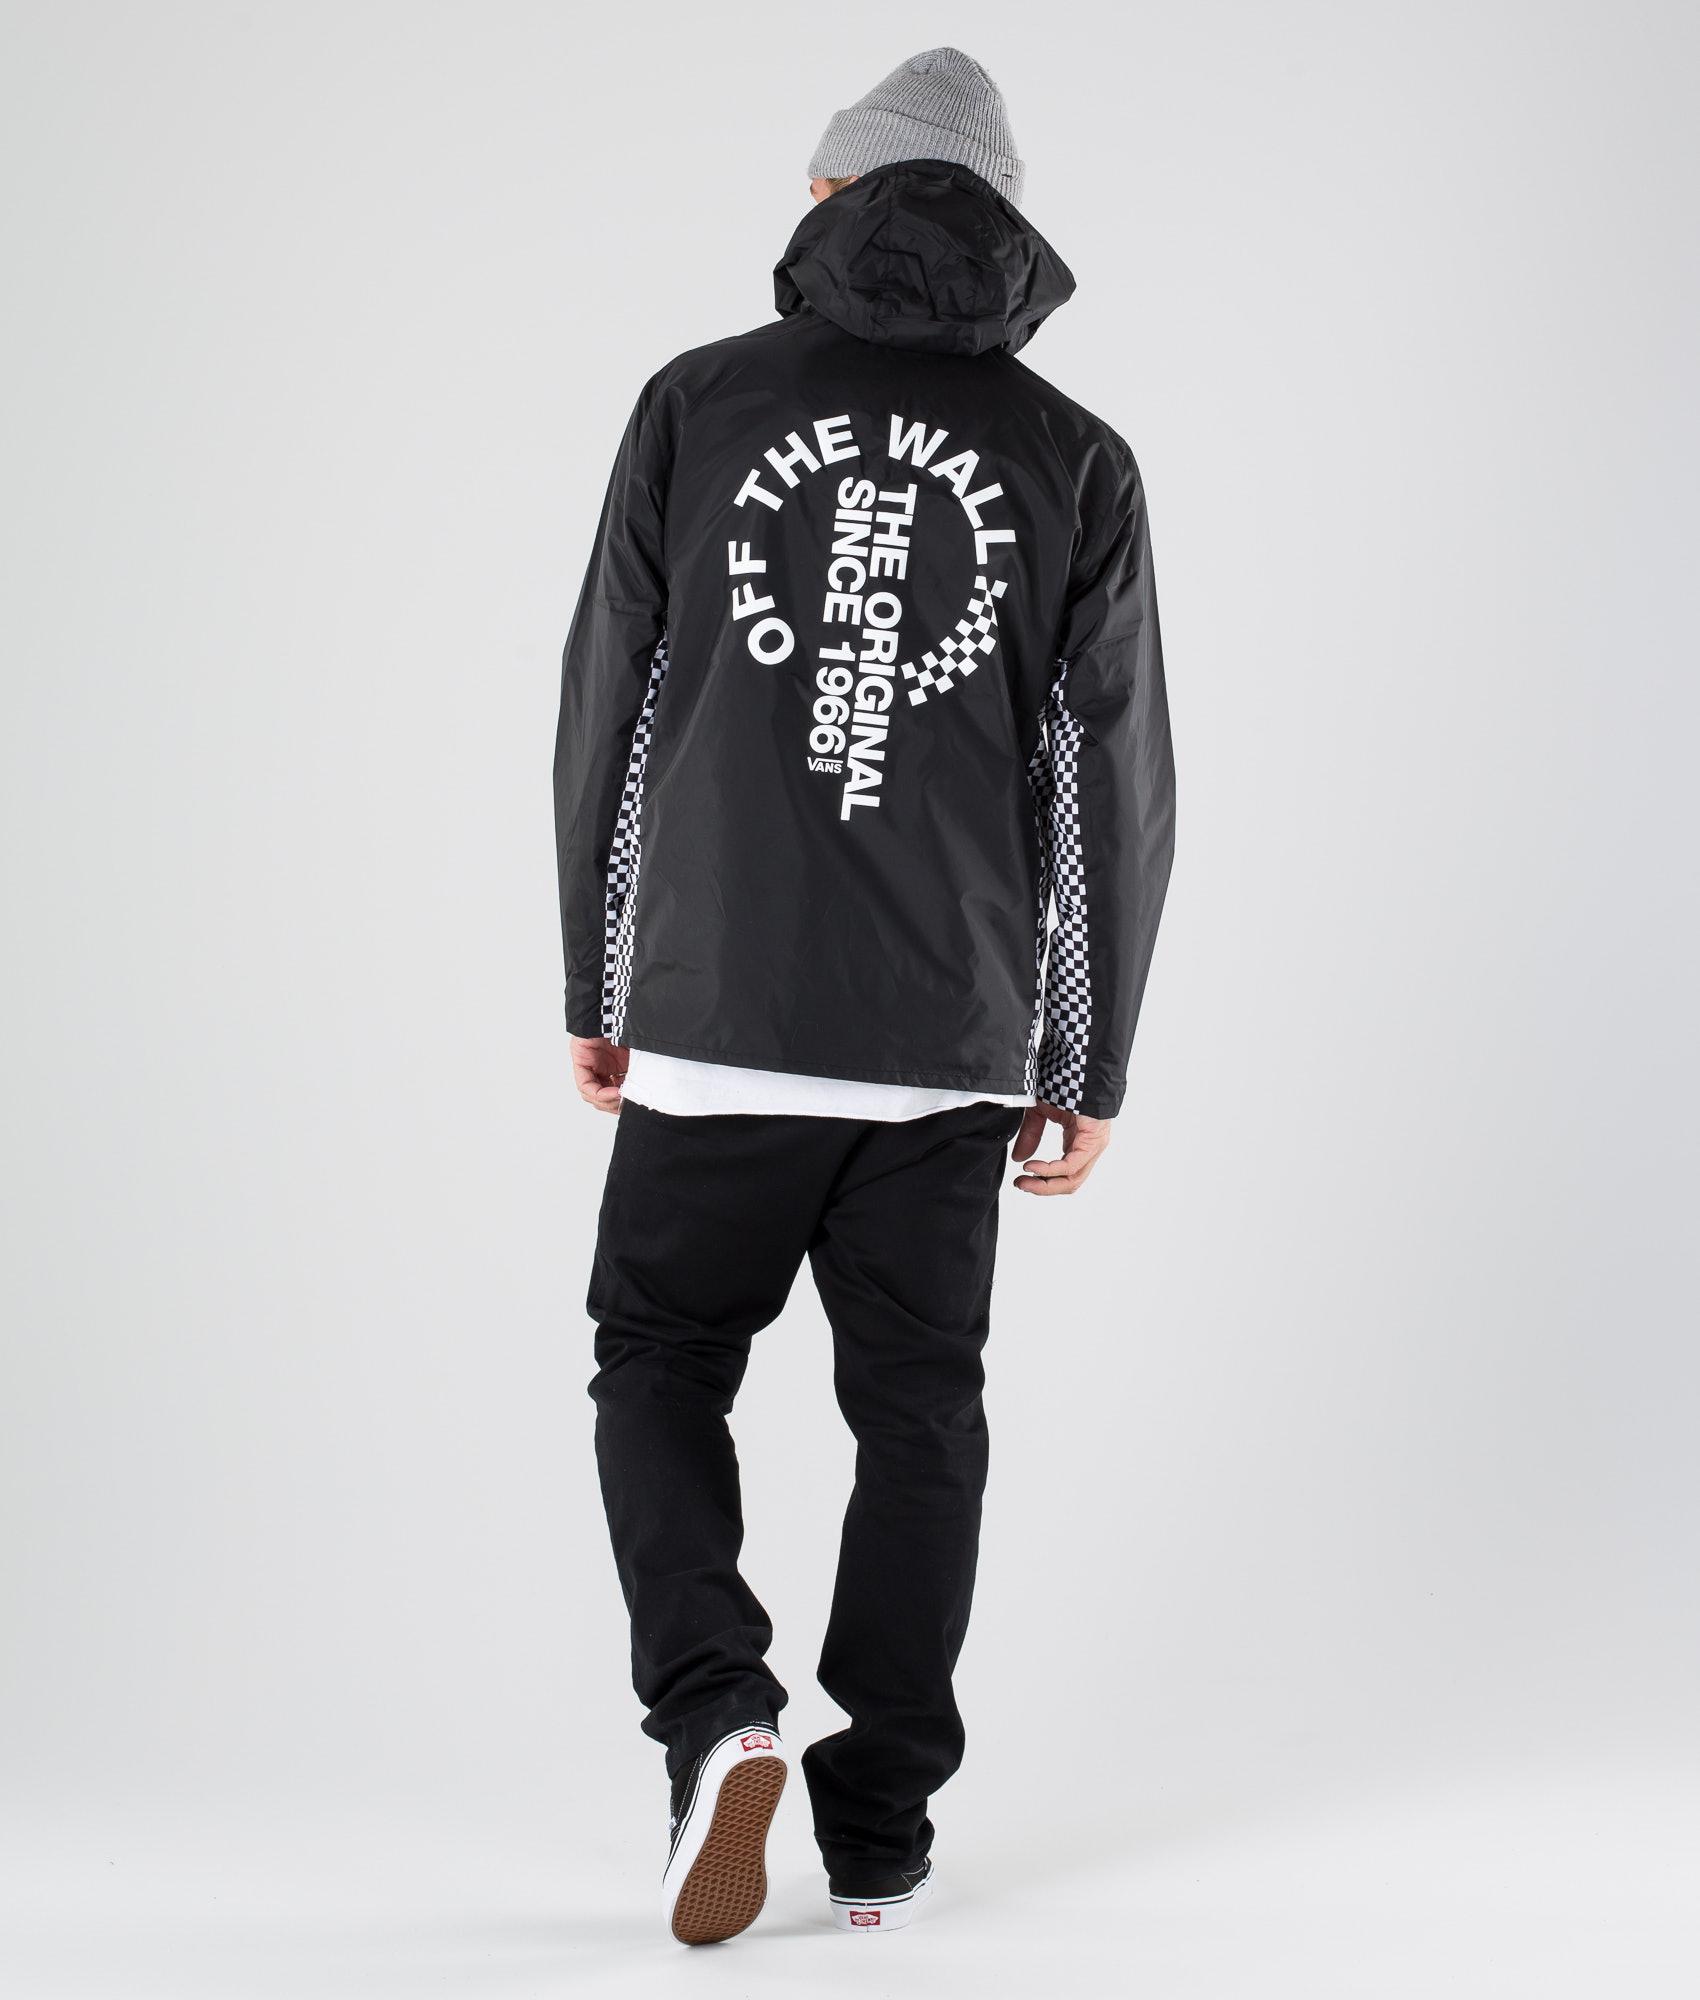 cc1fb2dae97 Vans Otw Distort Anorak Jacket Black - Ridestore.com